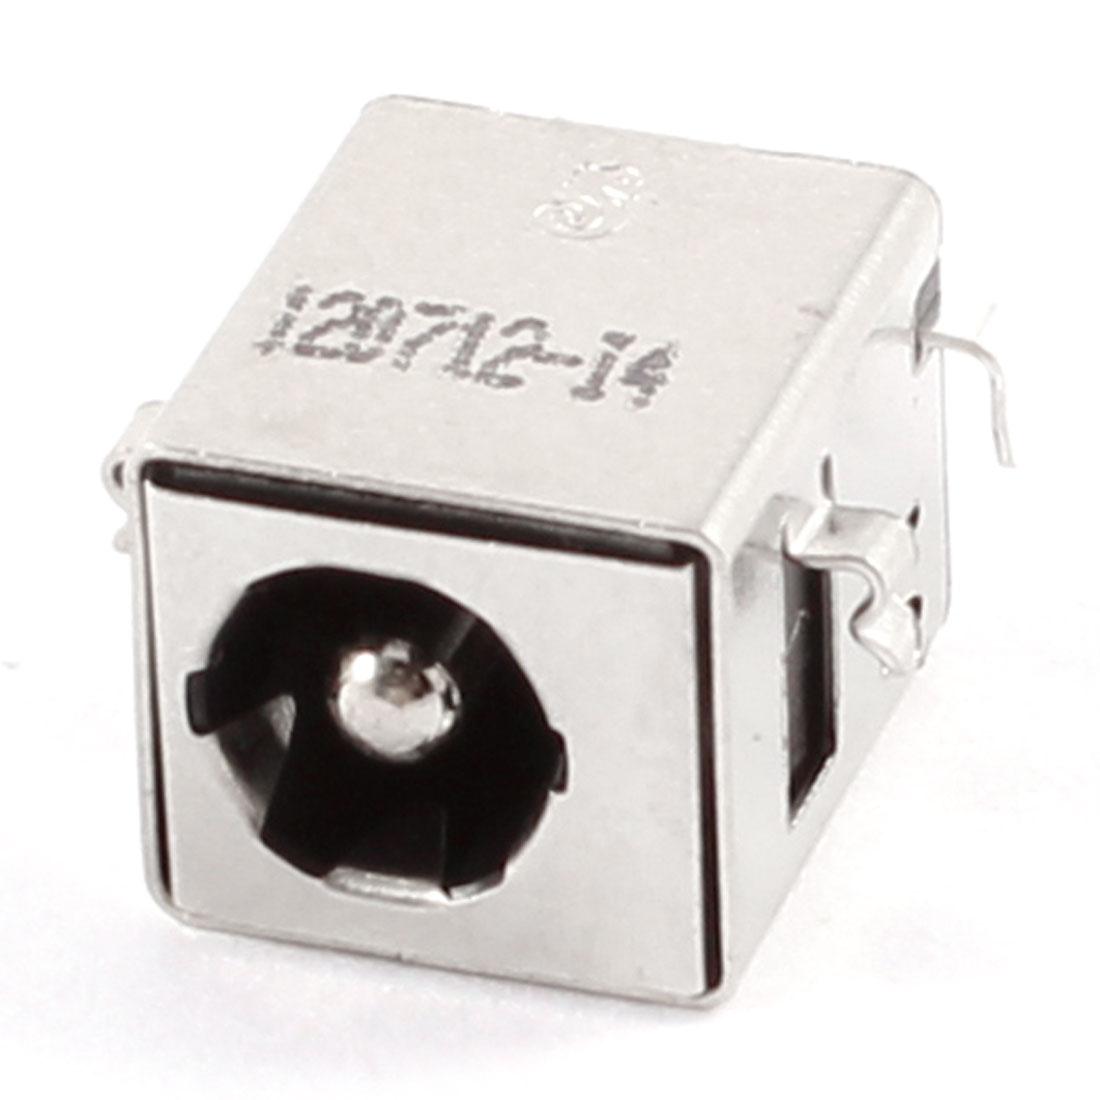 5.5mm x 2.35mm Pin Diameter PJ044 DC Power Jack Connector Socket